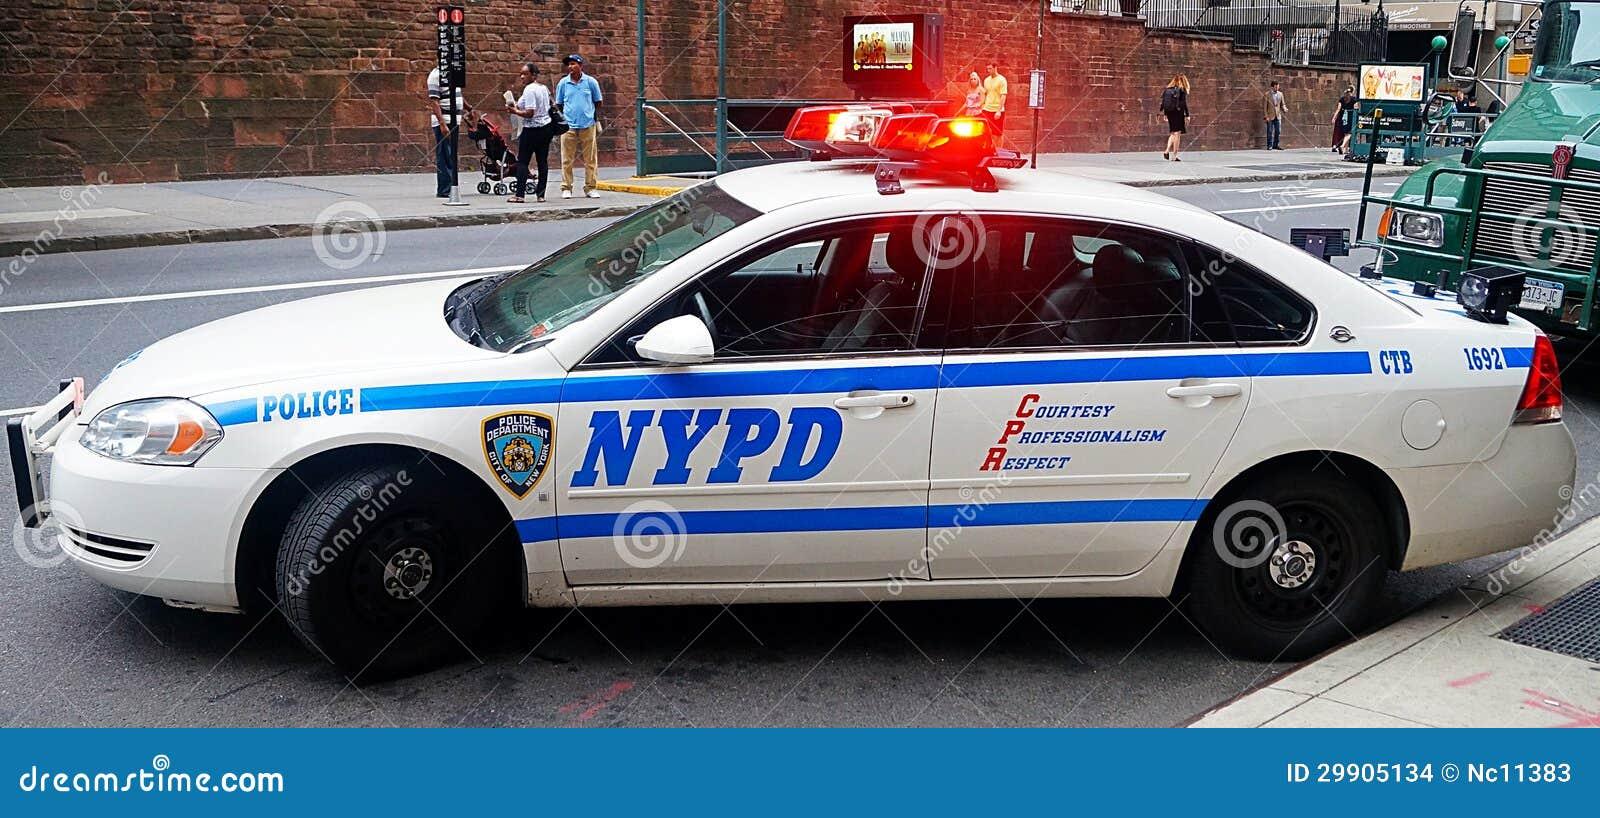 voiture de patrouille de nypd image stock ditorial image du urgence police 29905134. Black Bedroom Furniture Sets. Home Design Ideas